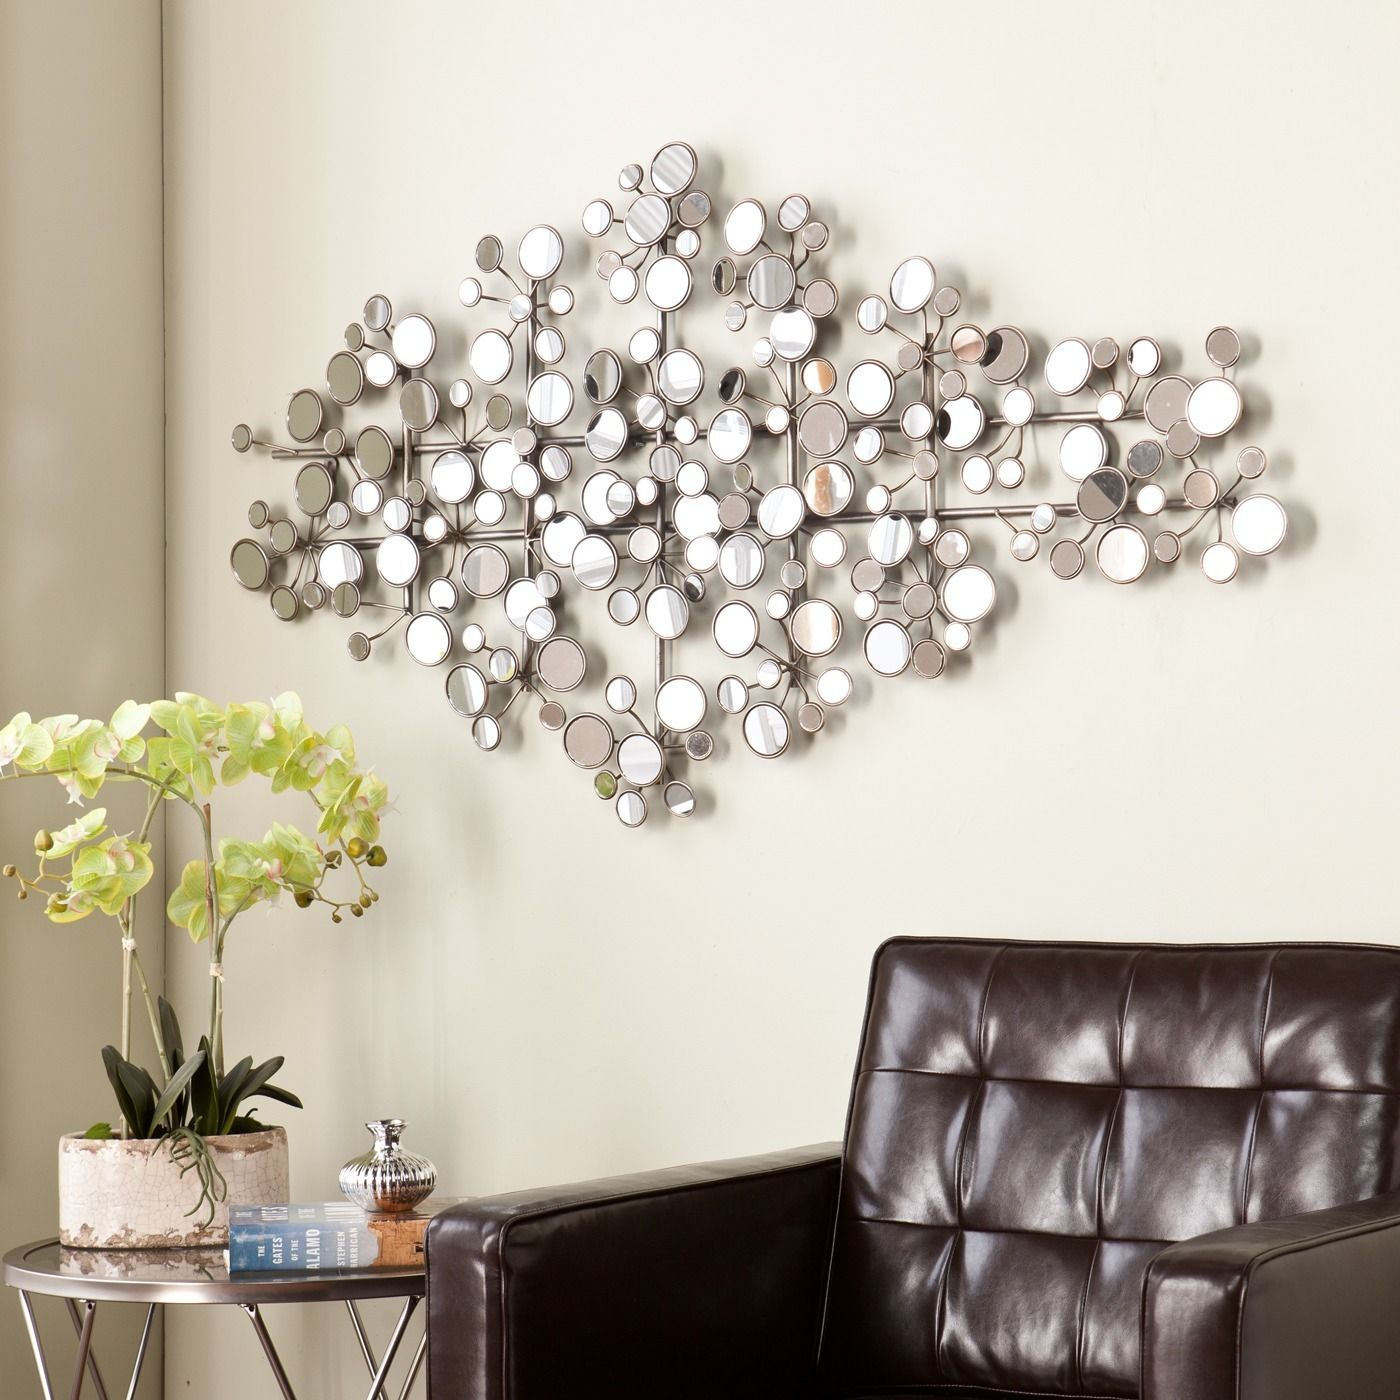 Harper Blvd Olivia Mirrored Metal Wall Sculpture 15994538 Overstock Com Shopping Big